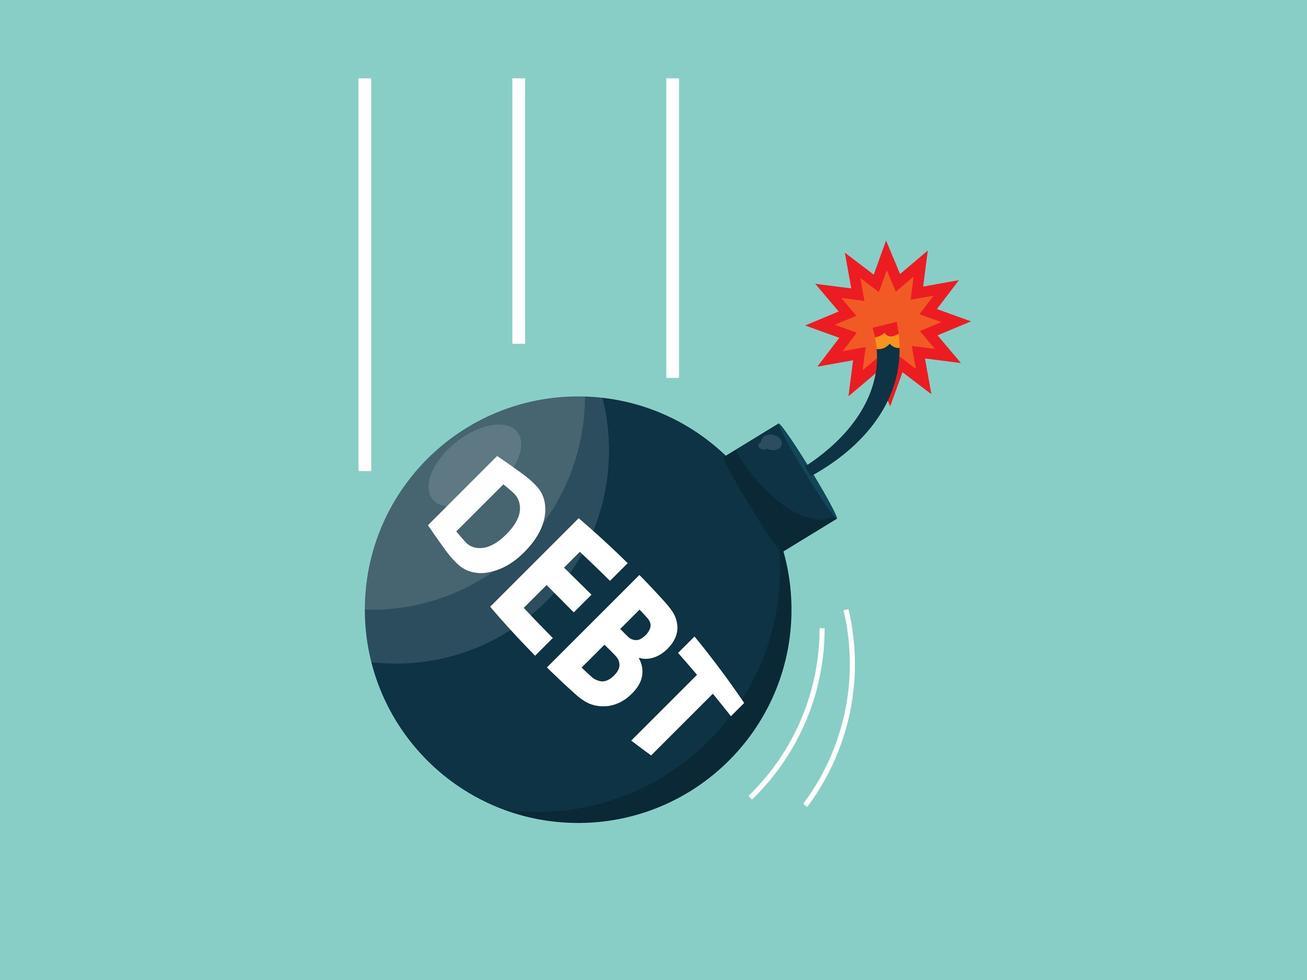 bomba da dívida caindo do céu vetor